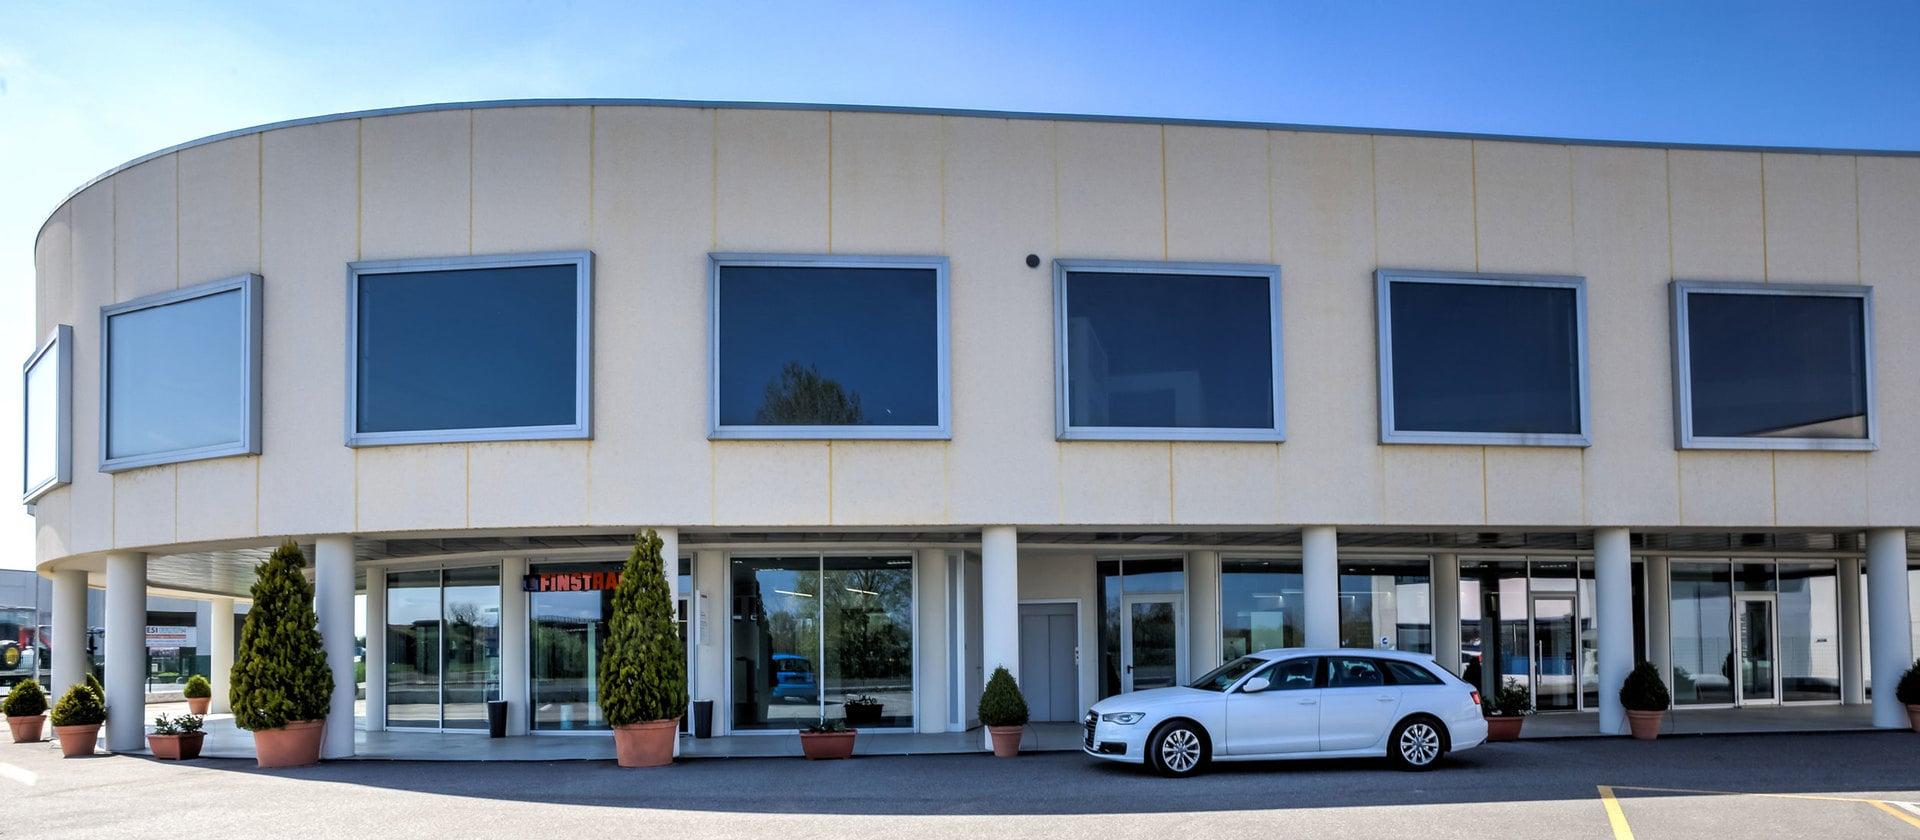 Studio Finstral Alessandria